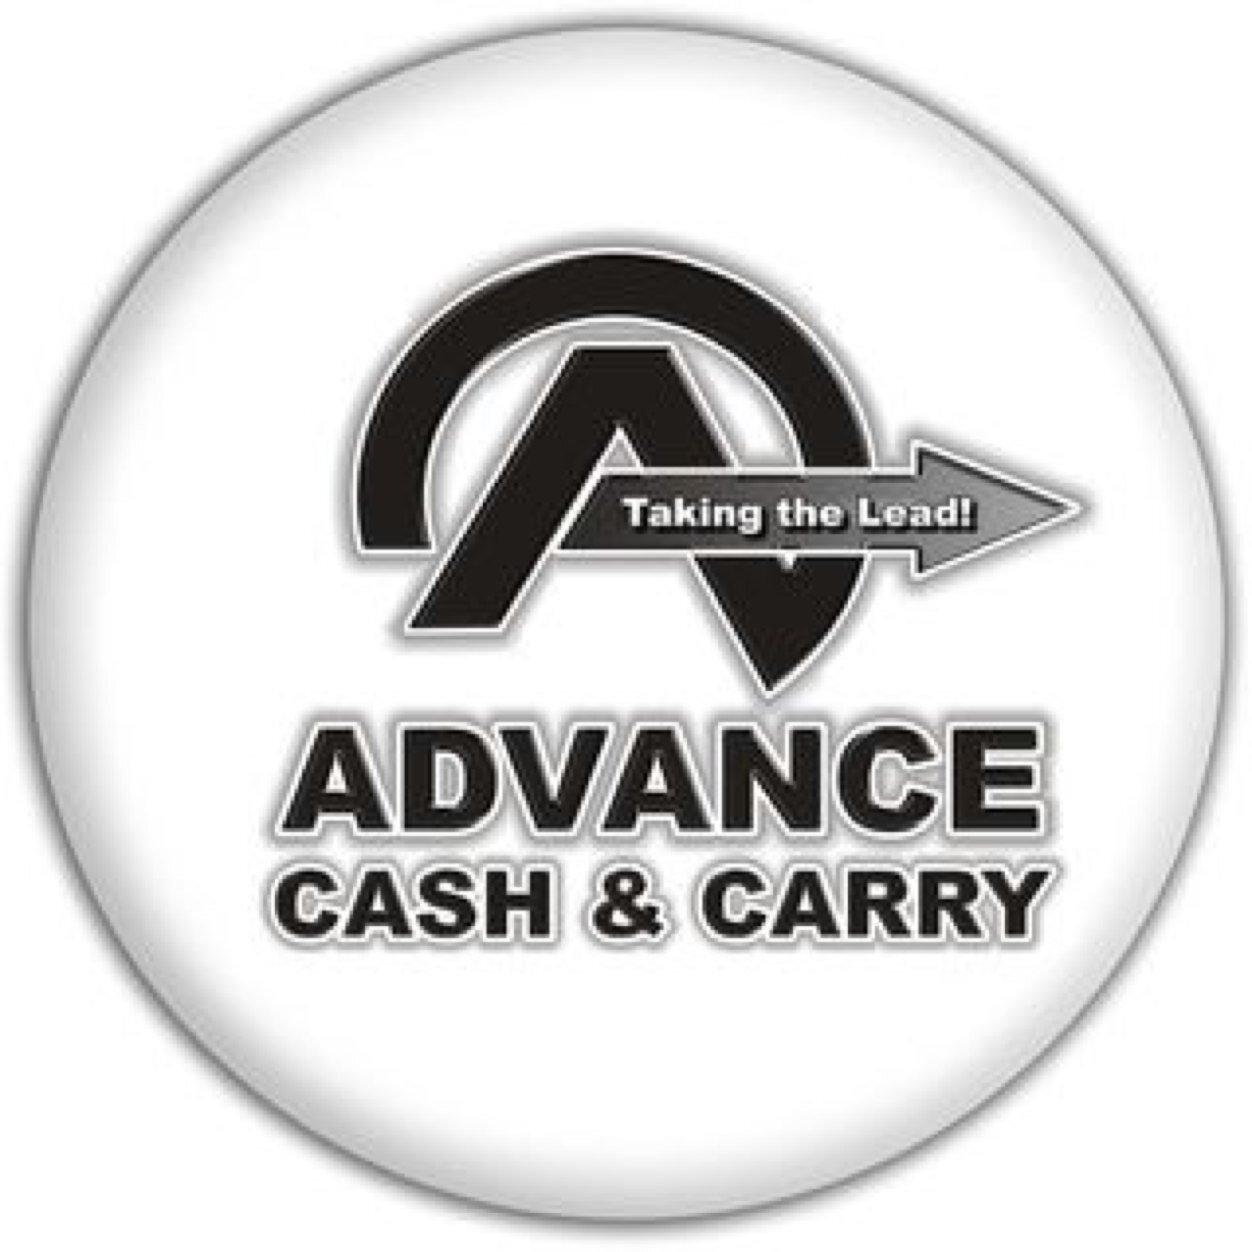 Advance cash n carry (@advanceonline) | Twitter